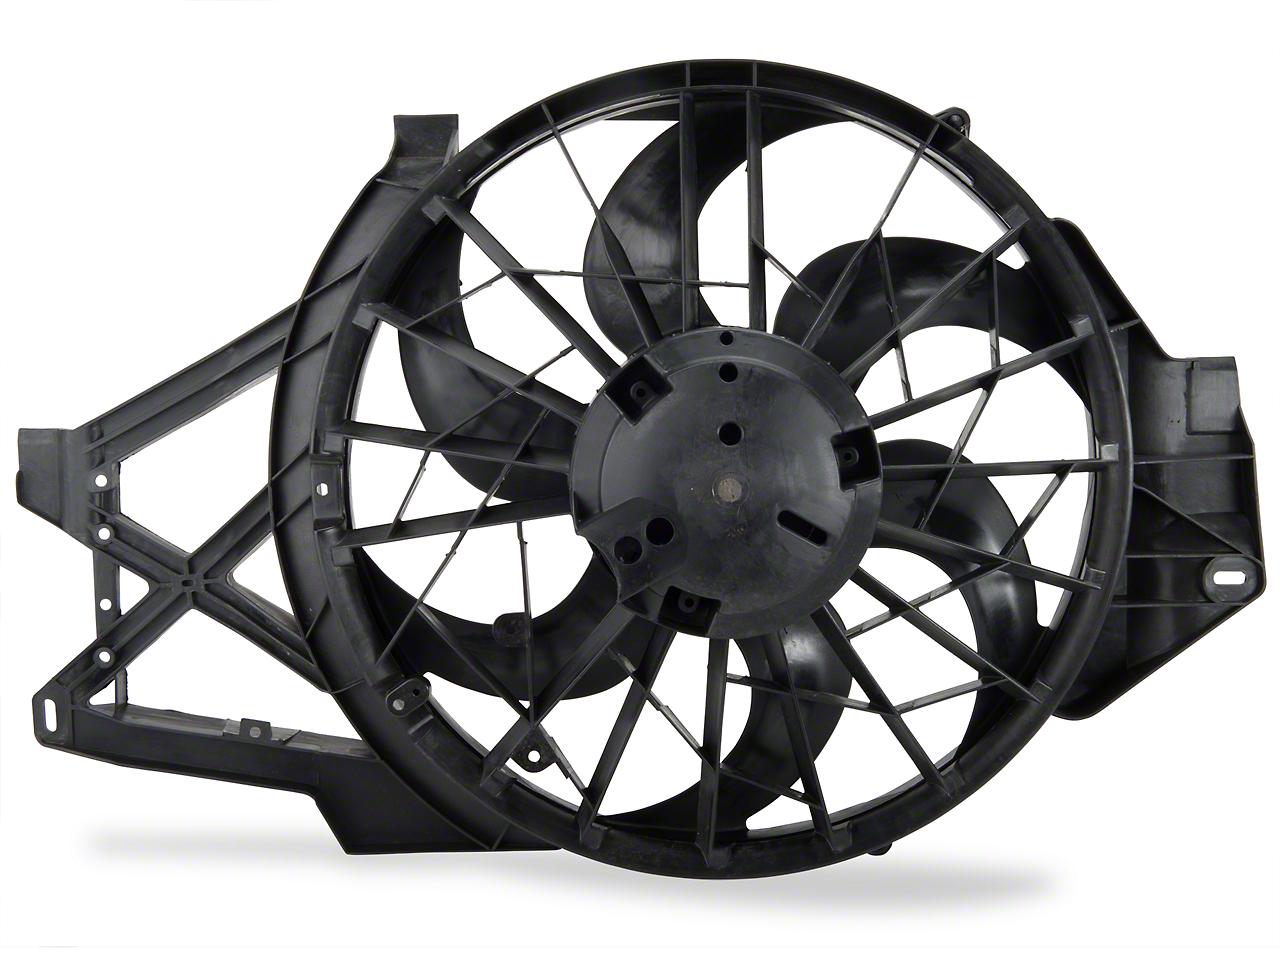 Radiator Fan Assembly (98-00 GT, Cobra)